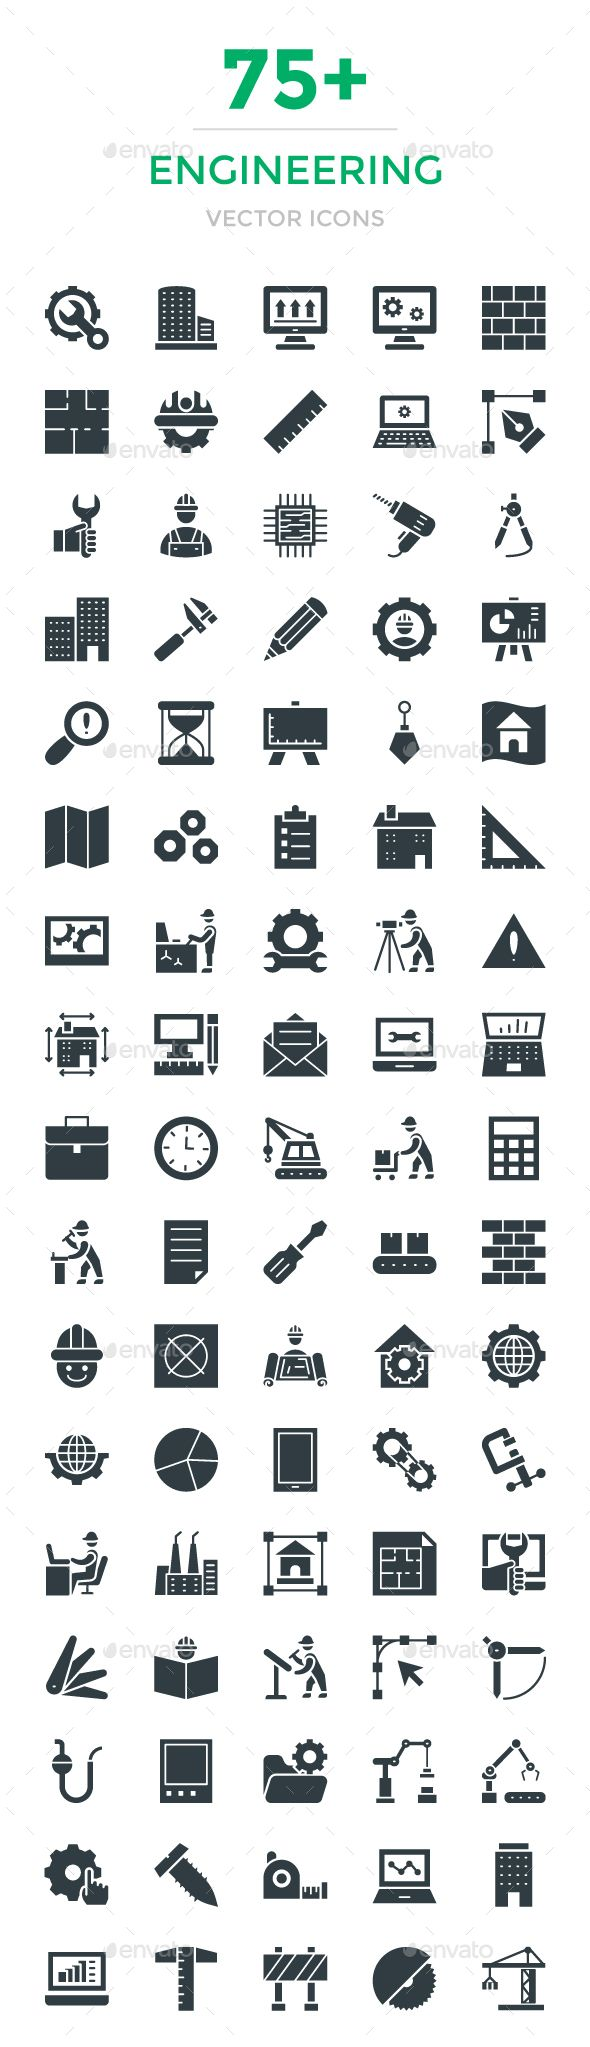 75+ Engineering Vector Icons. Download here: https://graphicriver.net/item/75-engineering-vector-icons/16916642?ref=ksioks